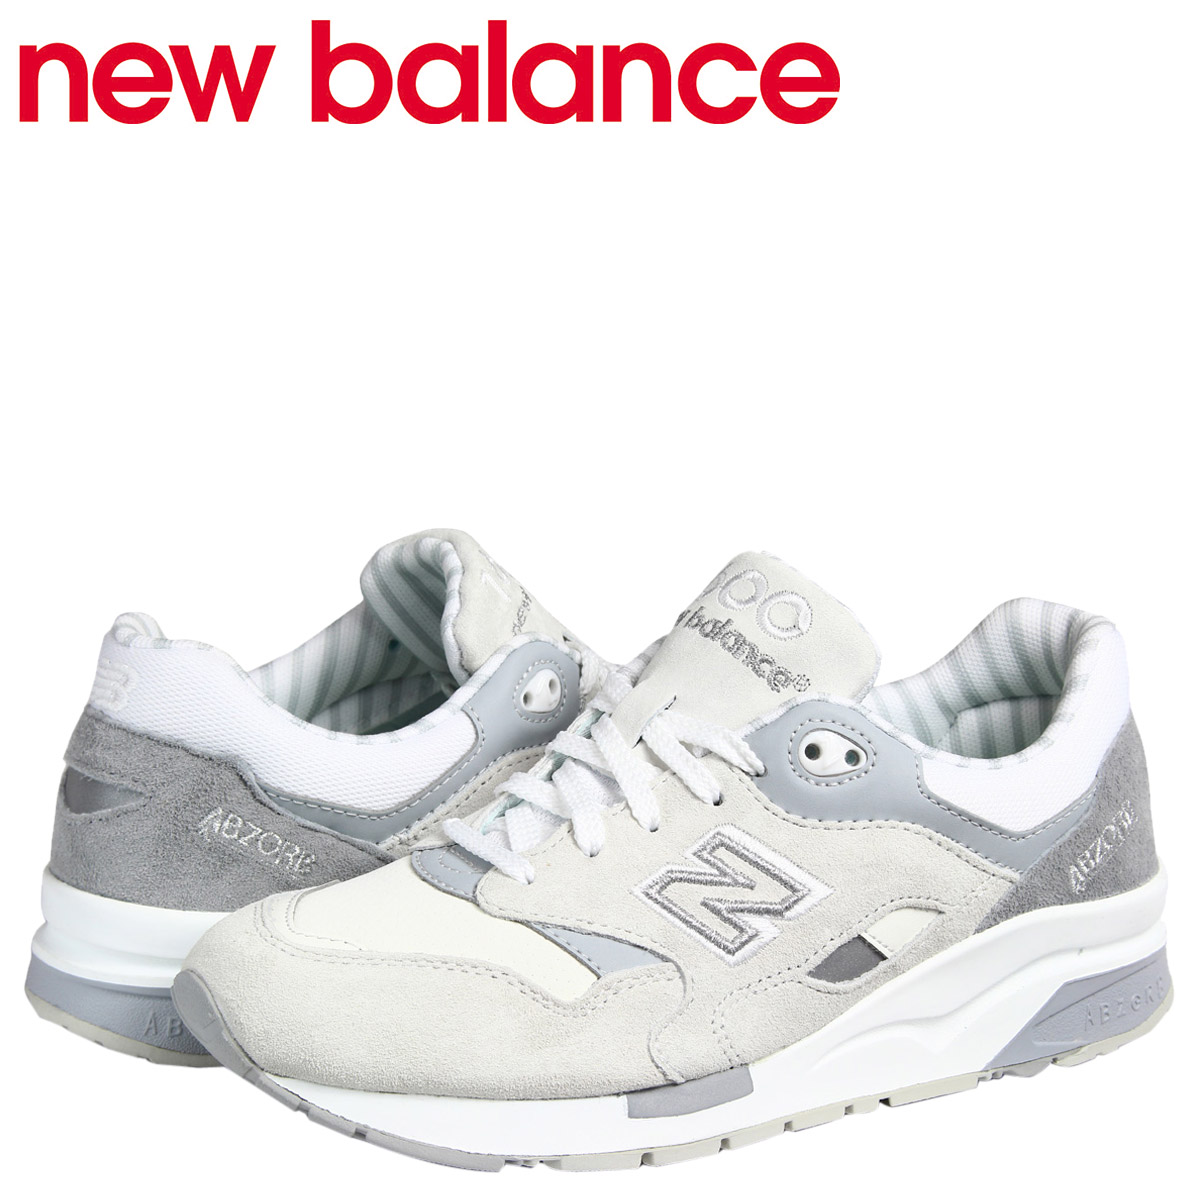 1600 new balance